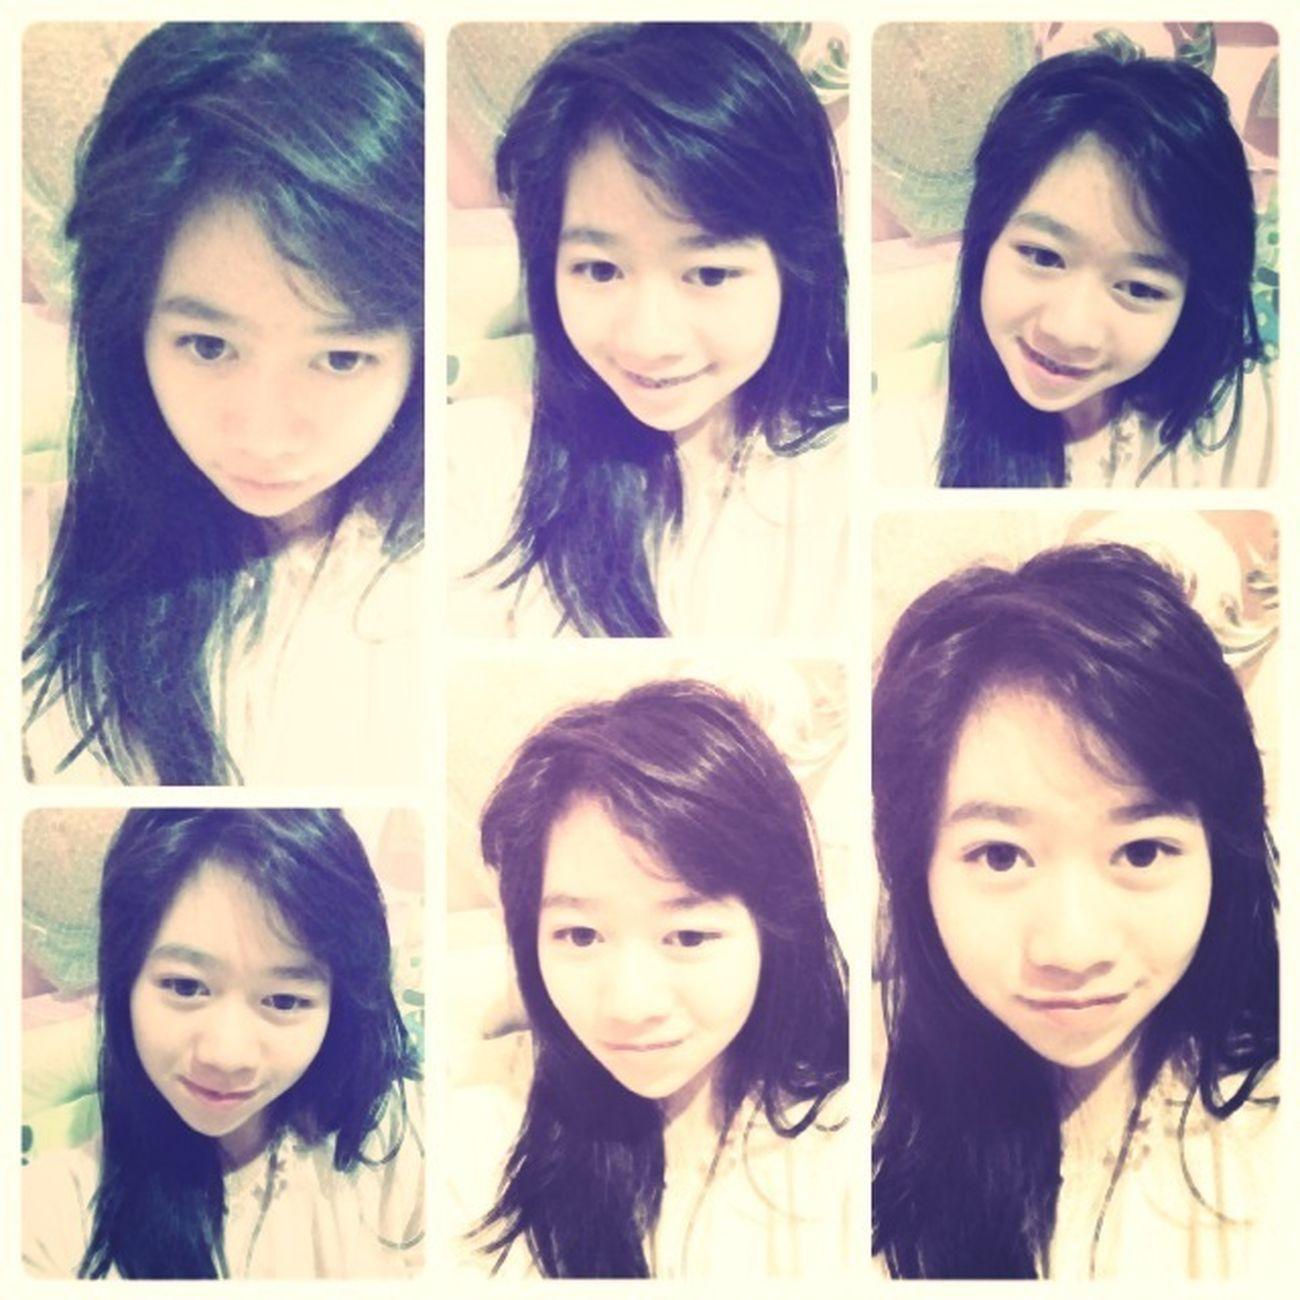 Messy Hair Dont Care NightyNight Goodnight Everyone <3 Enjoying Life